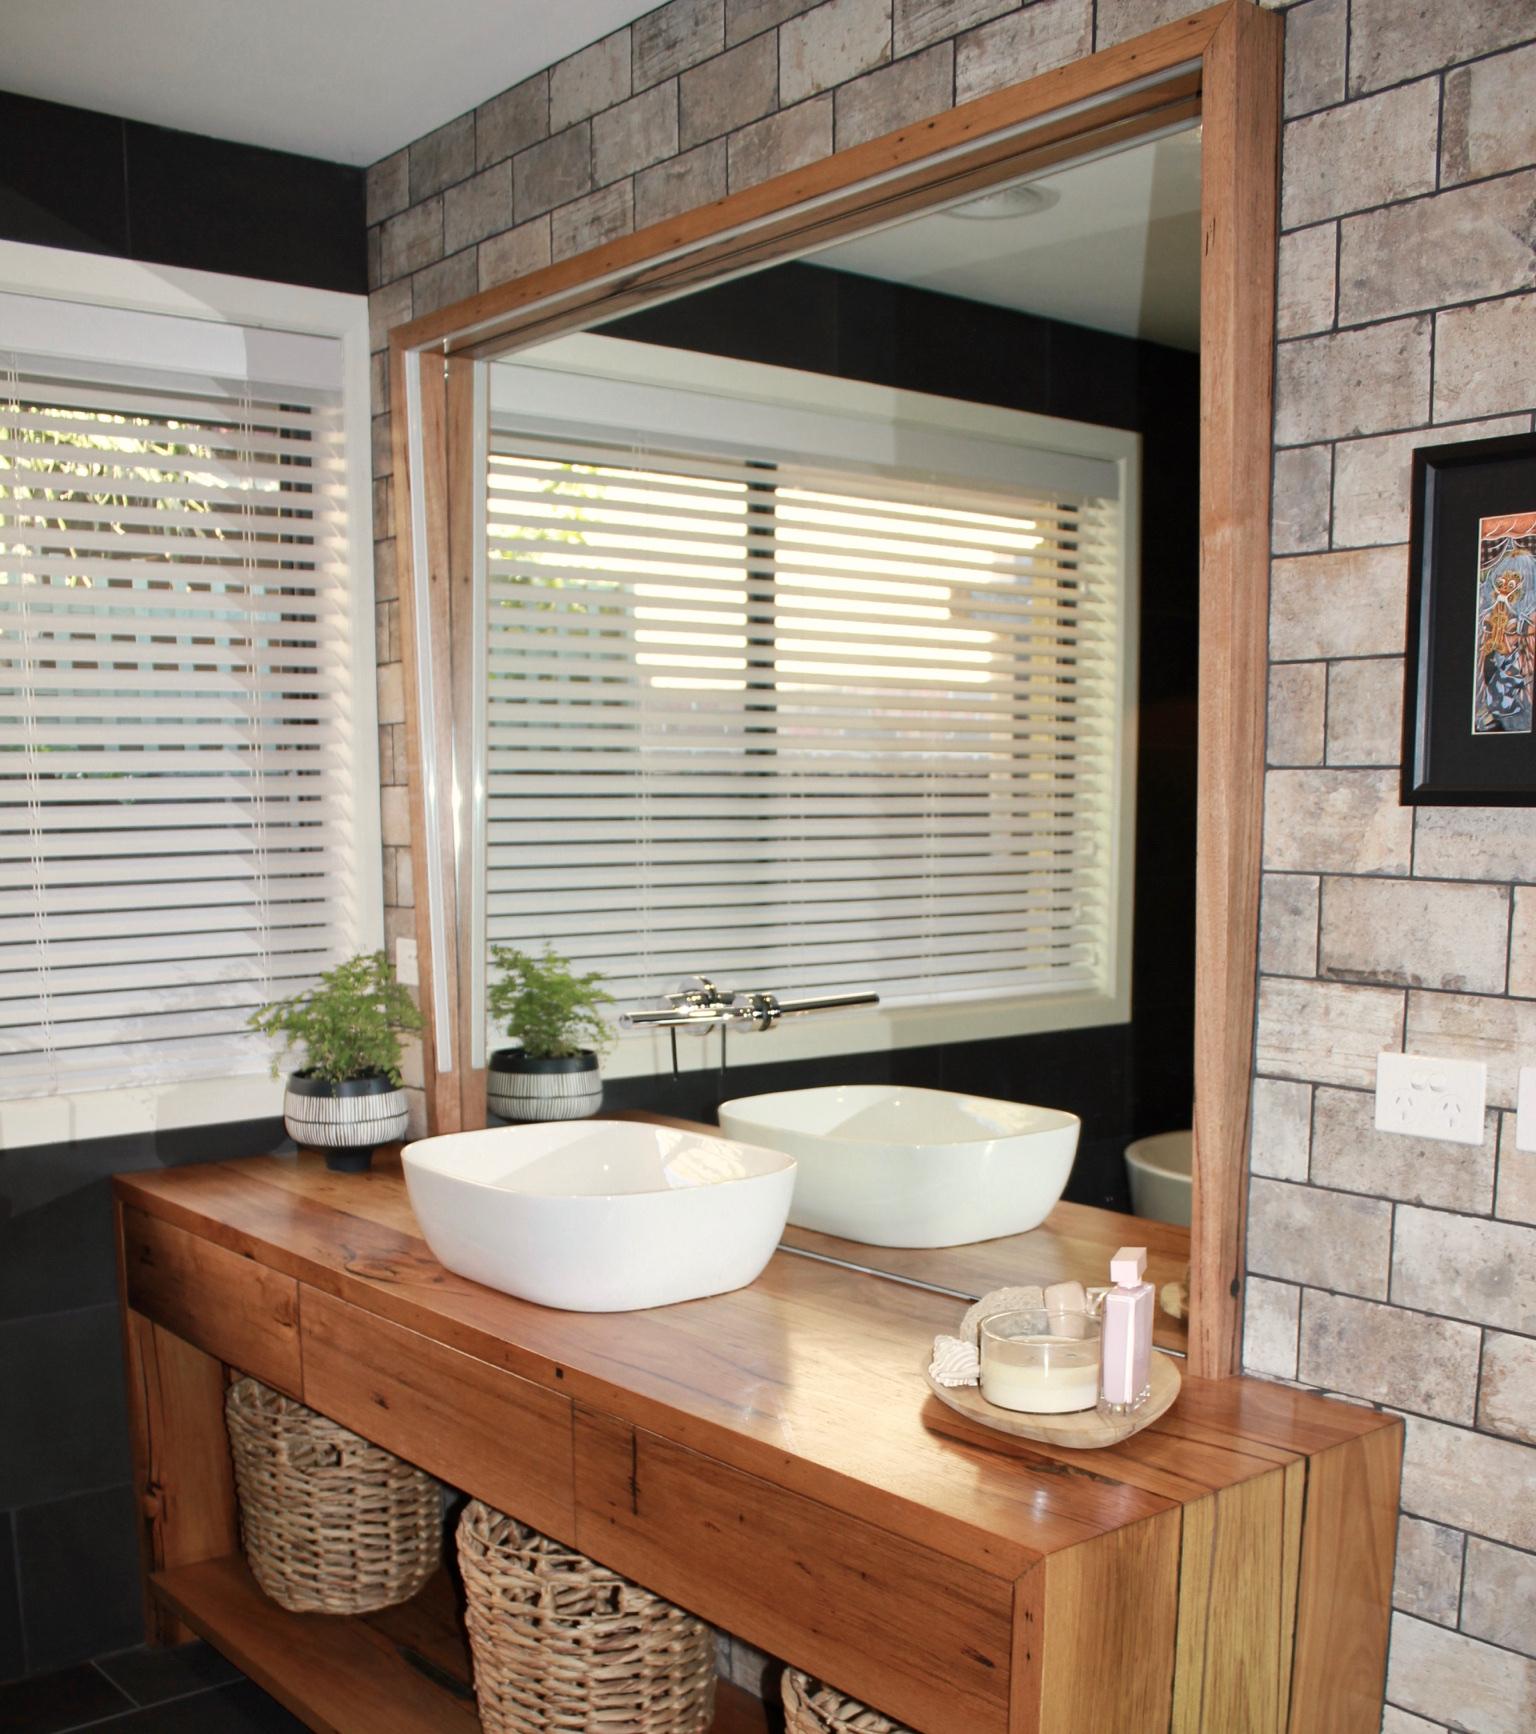 timber-striplight-bathroom-mirror.jpg